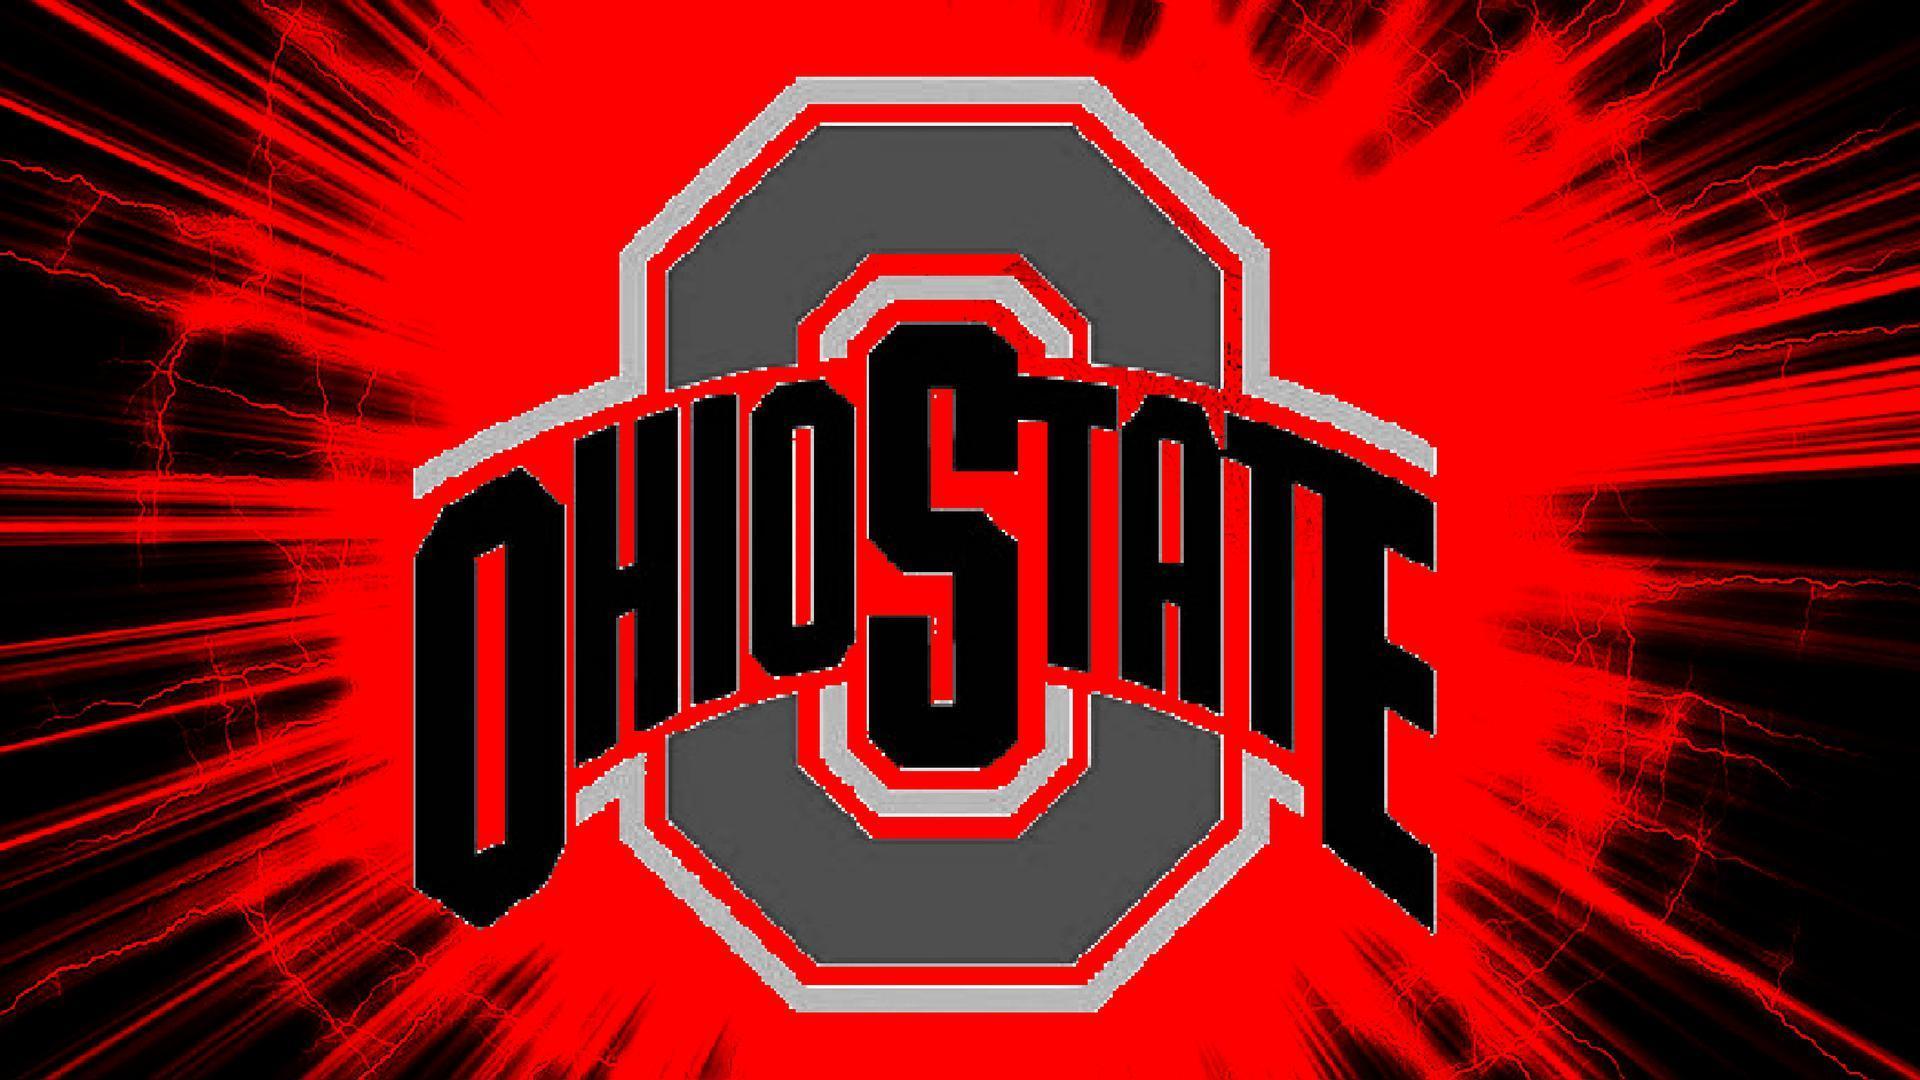 Ohio State Logo Wallpaper: Ohio State Buckeyes Wallpaper 1600x1200